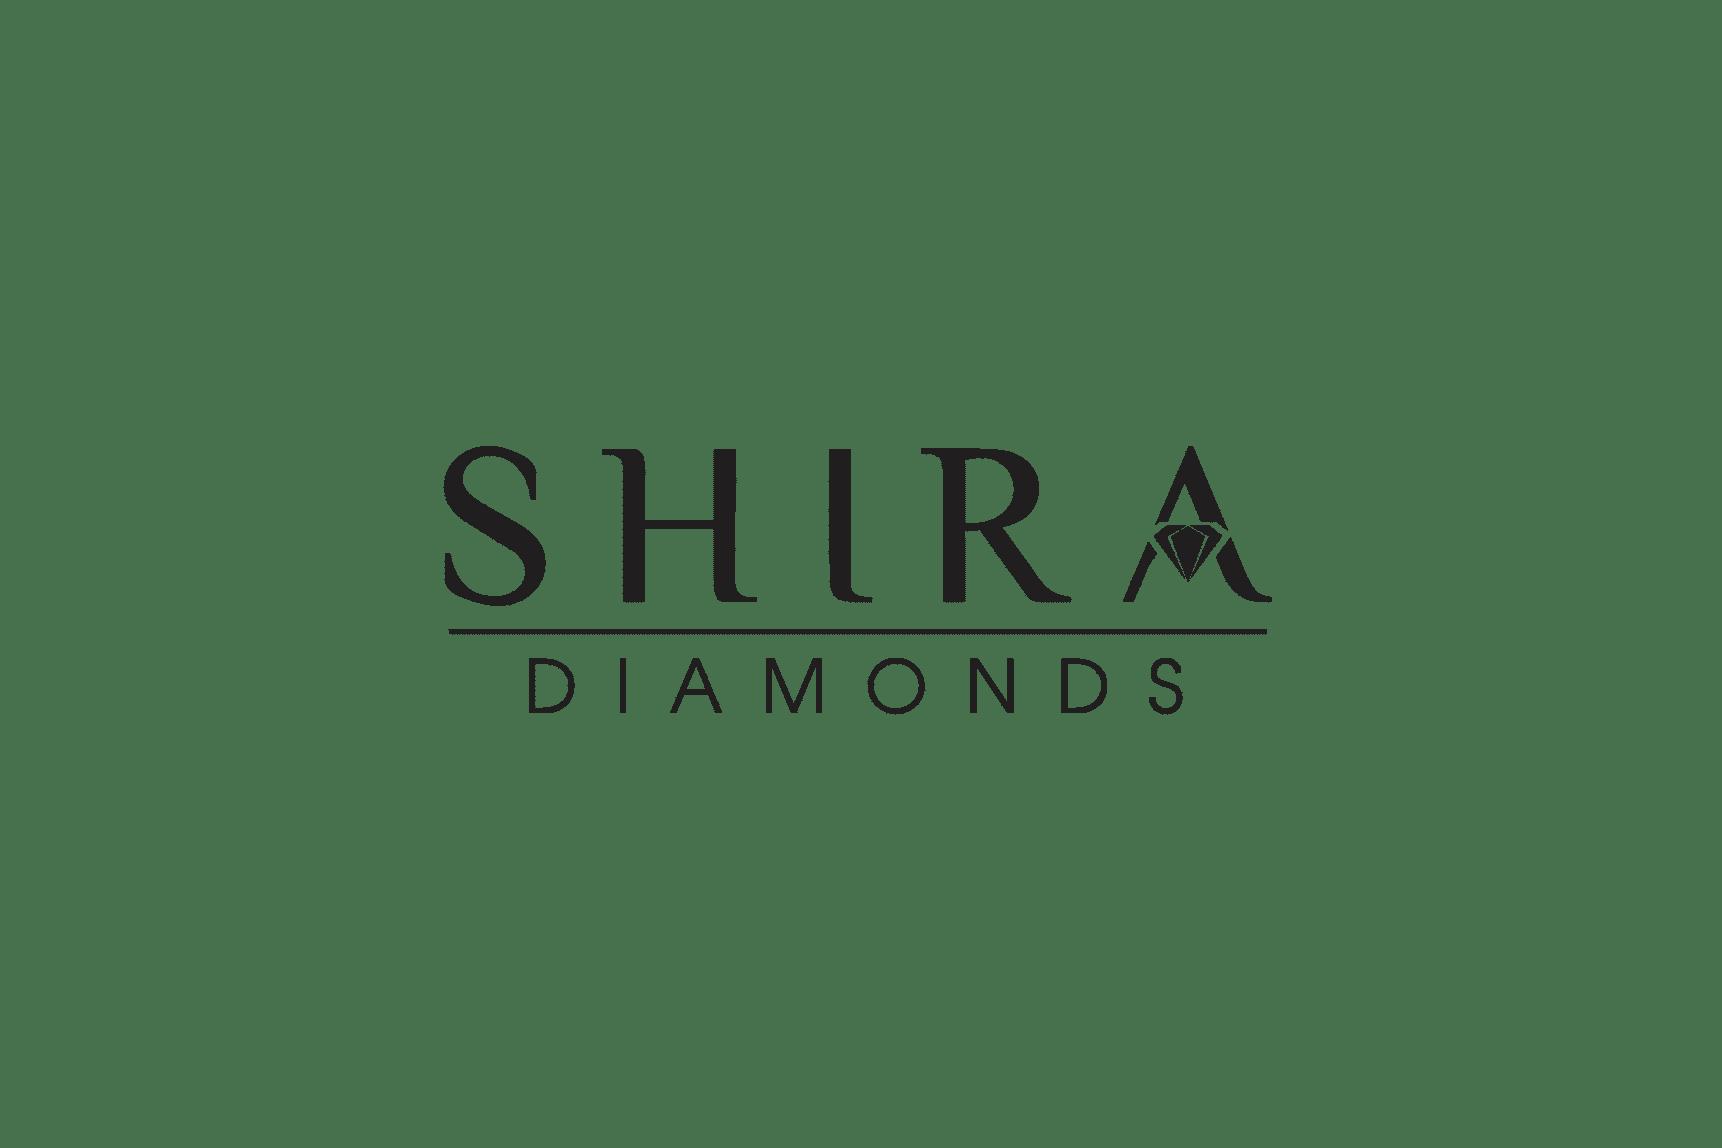 Shira Diamonds Dallas SEO Customer Custom Web Design SEO Long Island, Shira Diamonds